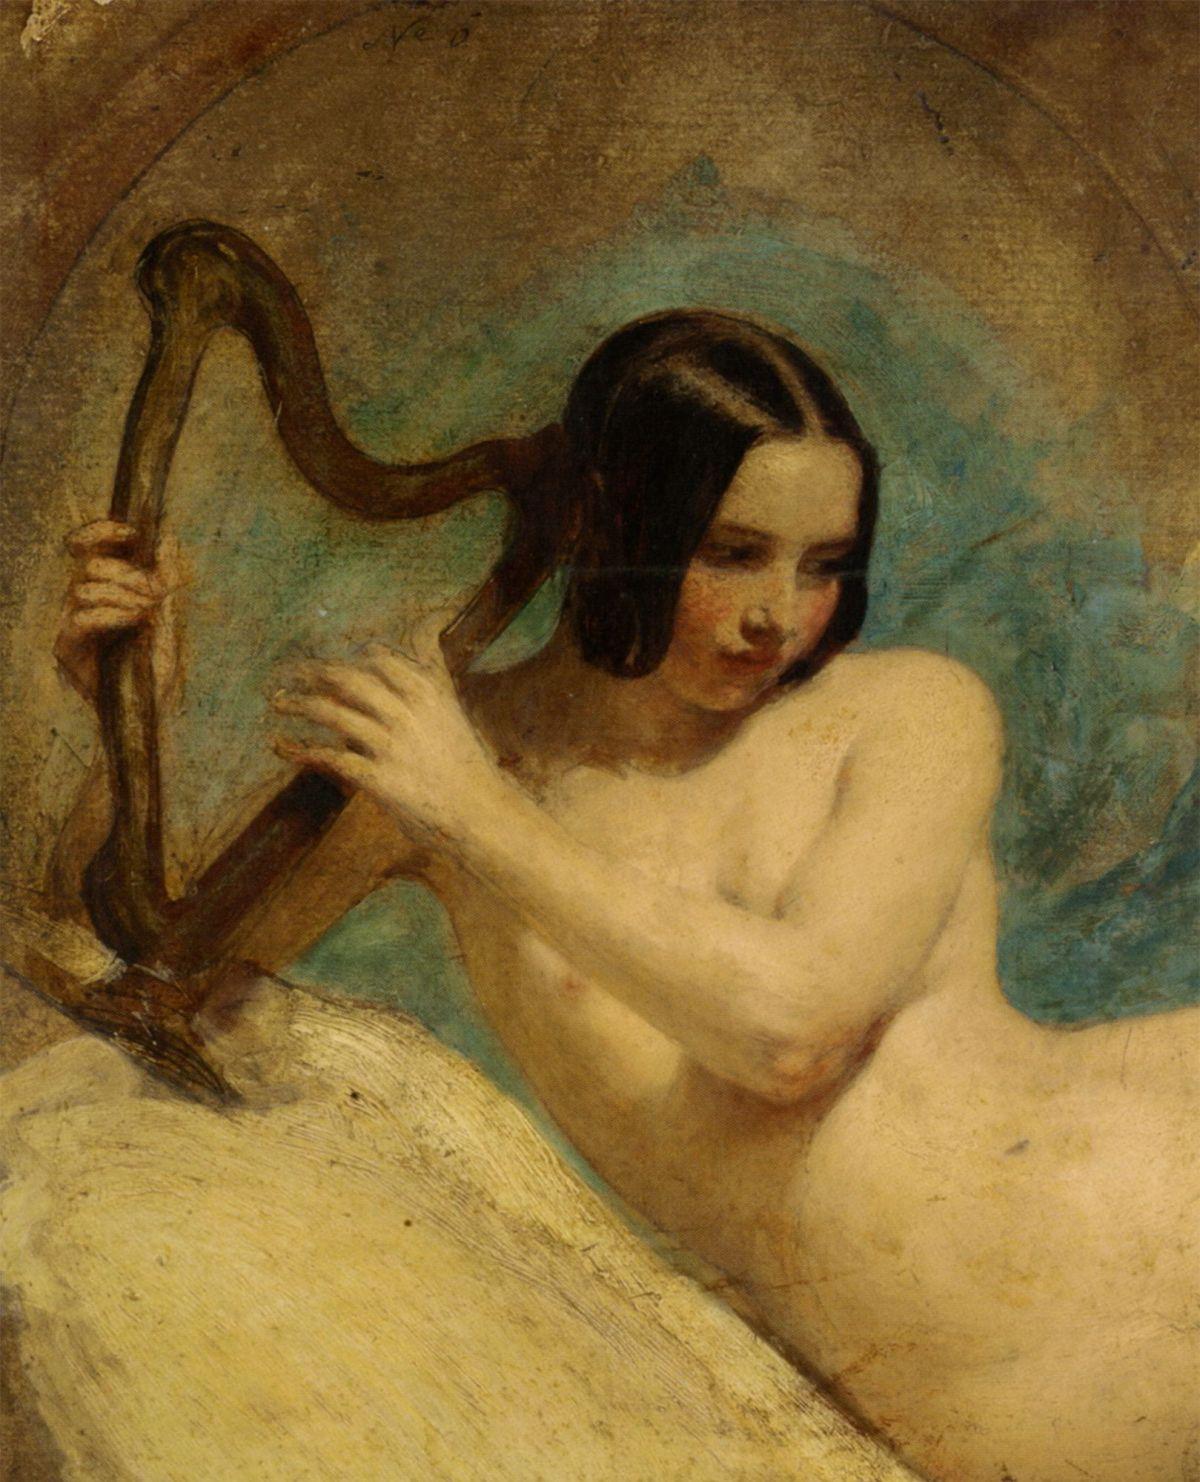 Terpischore by William Edward Frost (British Painting)